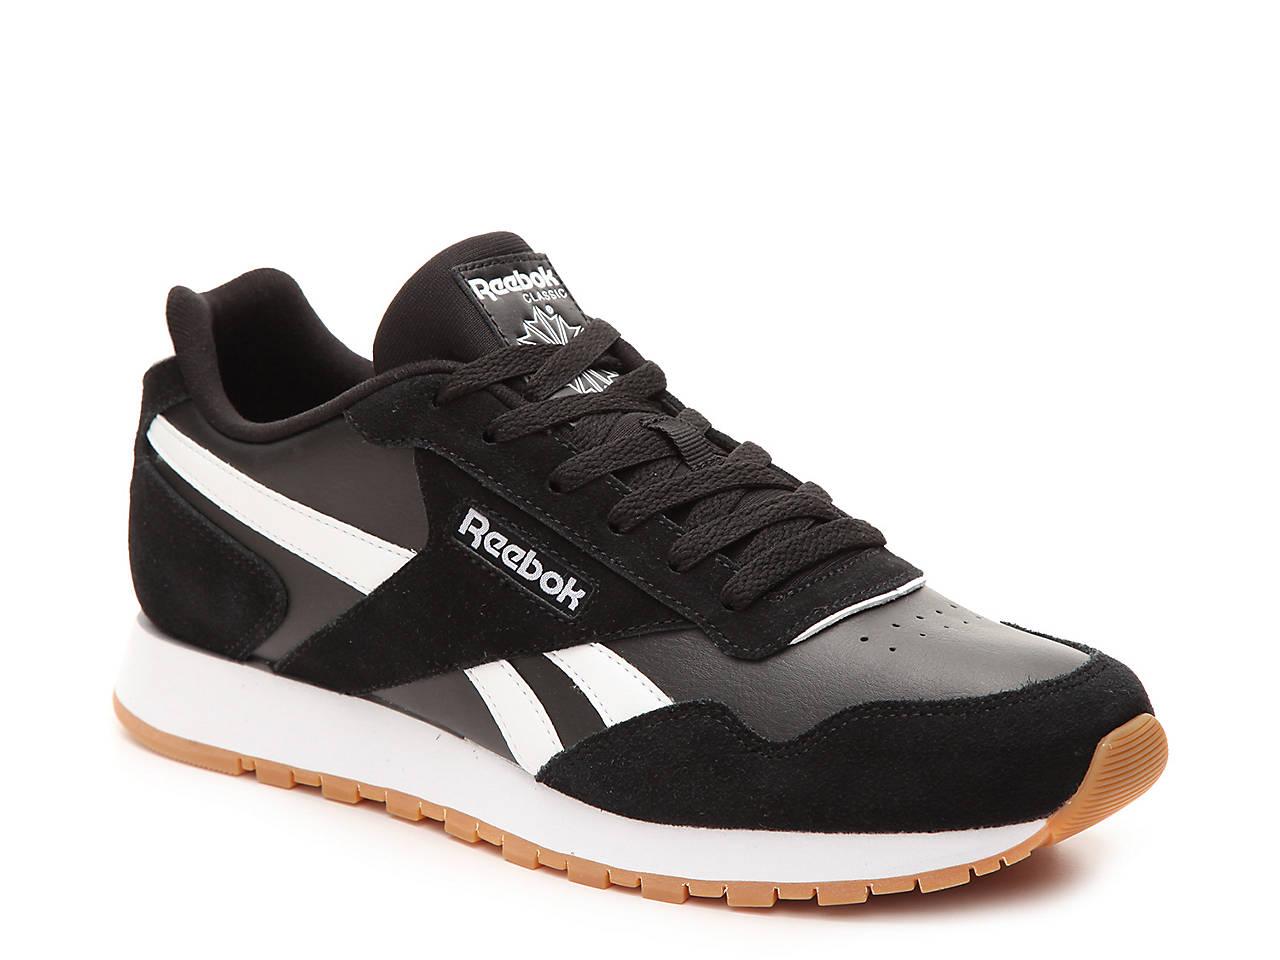 e423ea6e2d9 Reebok Classic Harman Sneaker - Men s Men s Shoes